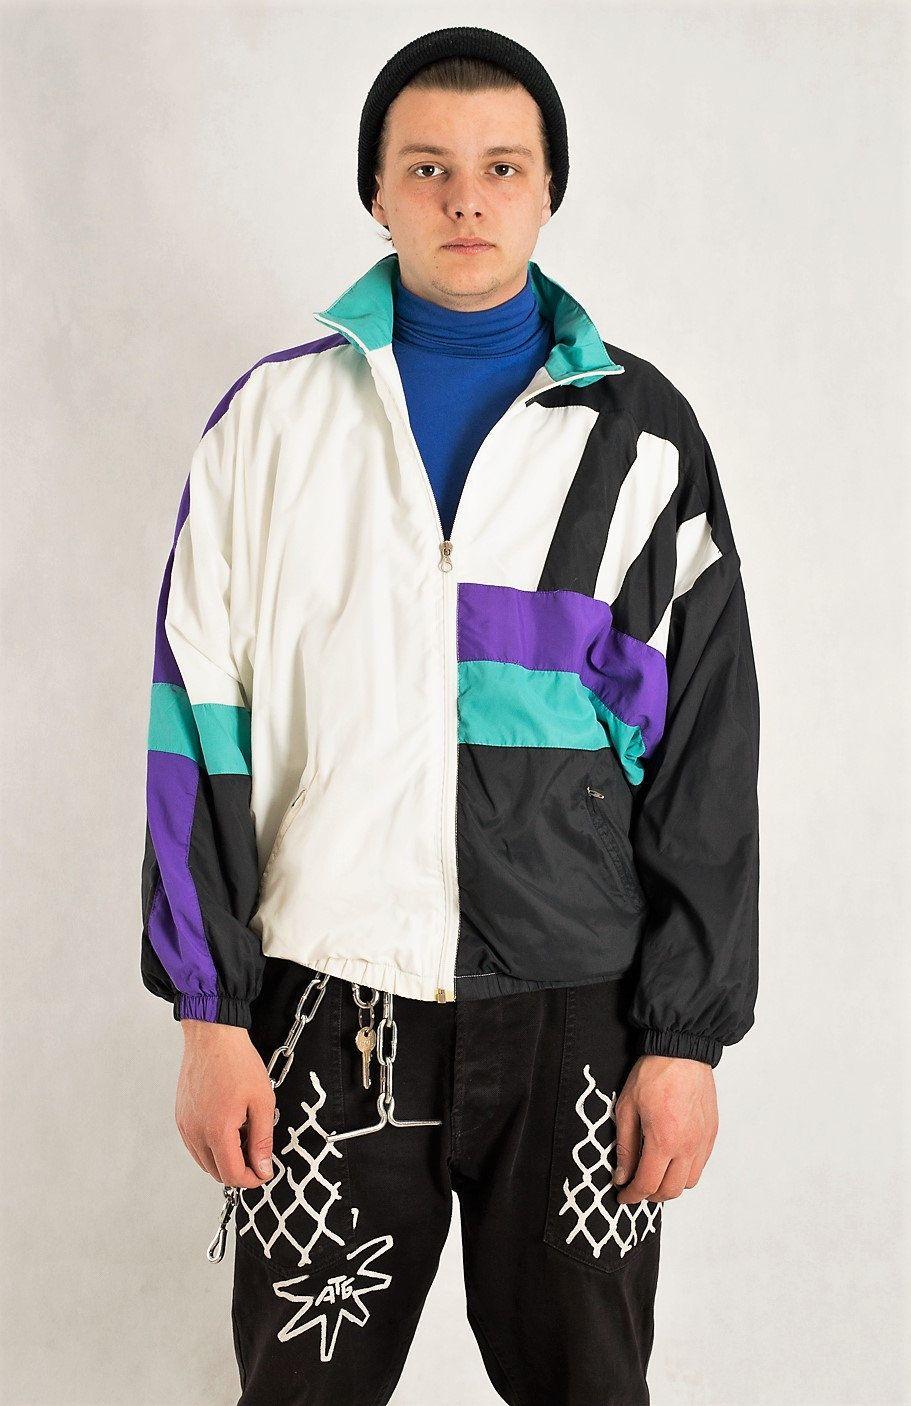 Vintage 90s Sport Color Block Windbreaker Jacket Vintage Etsy Vintage Sportswear Vintage Clothes 90s Windbreaker Jacket